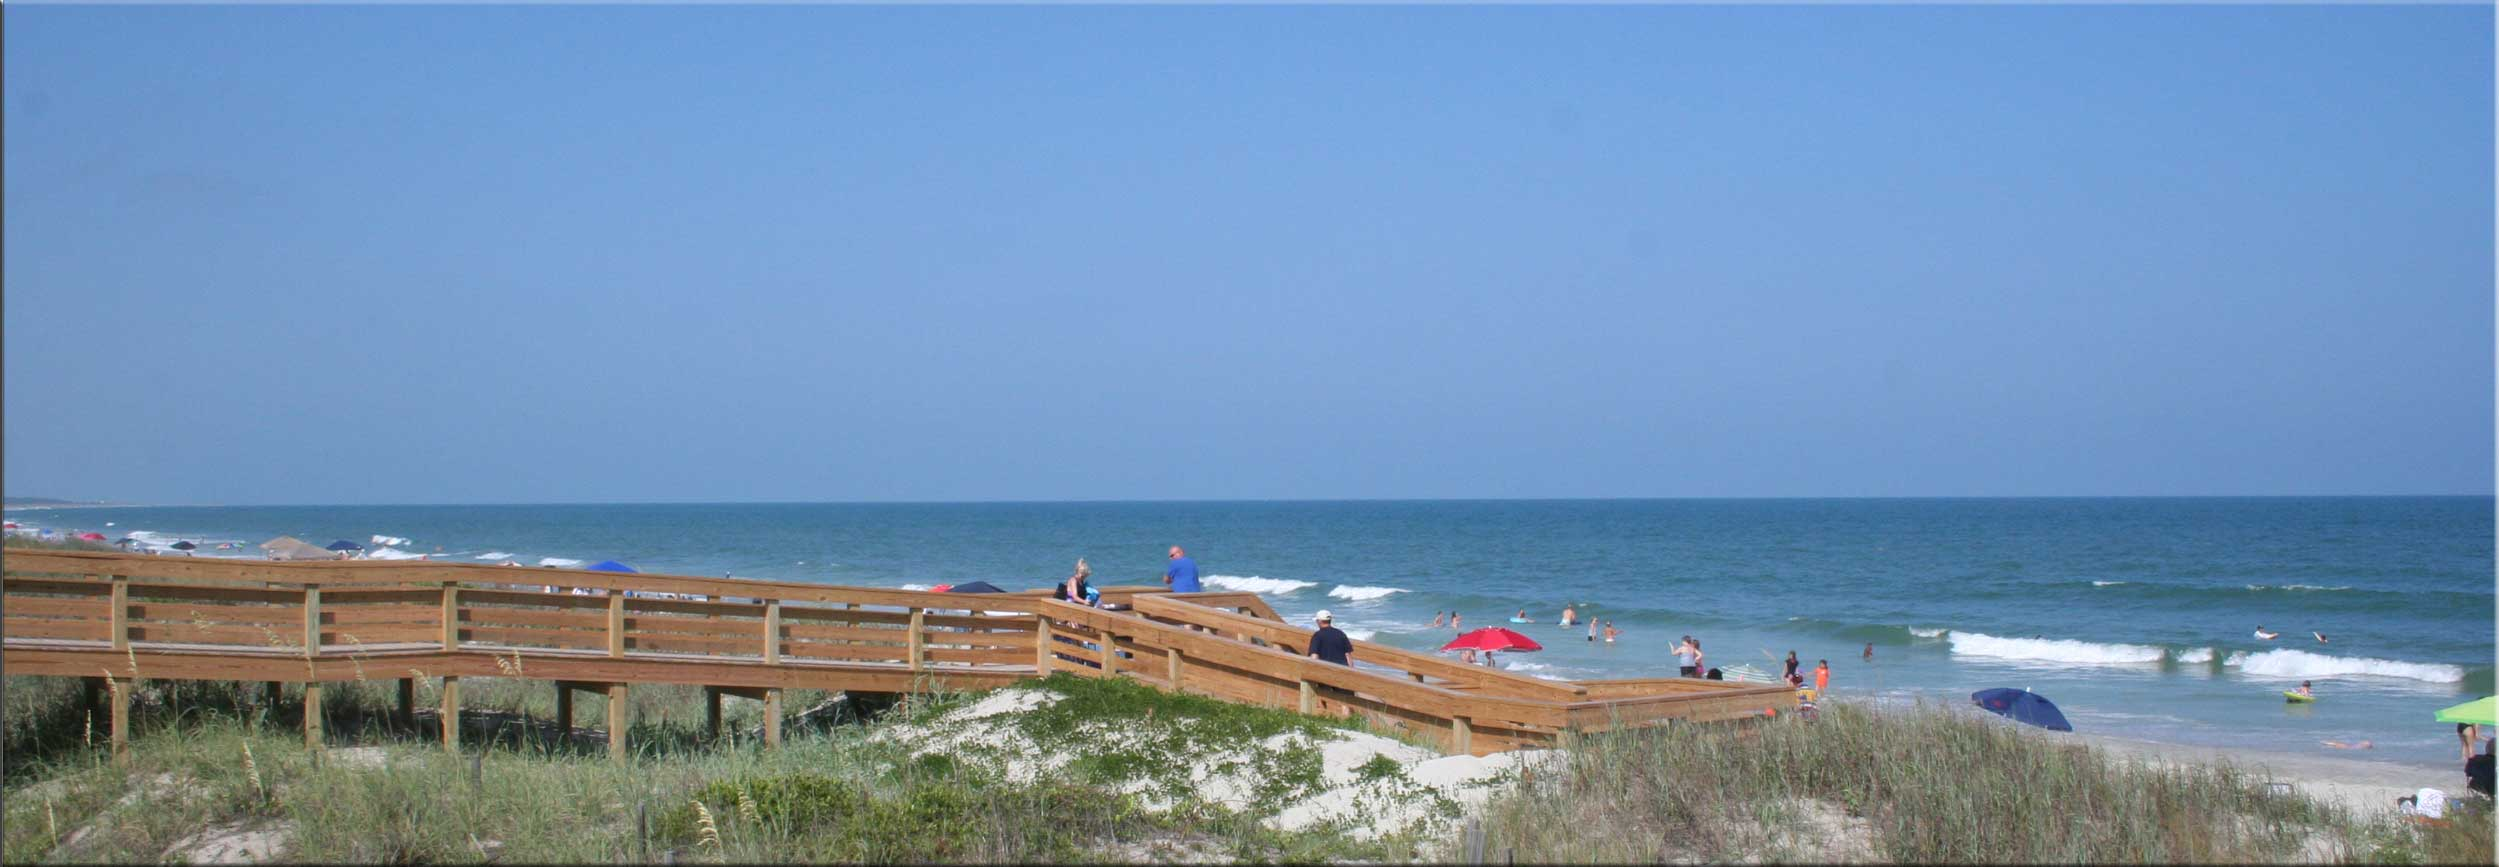 Properties A To Z Garden City Murrells Inlet Surfside Party Invitations Ideas